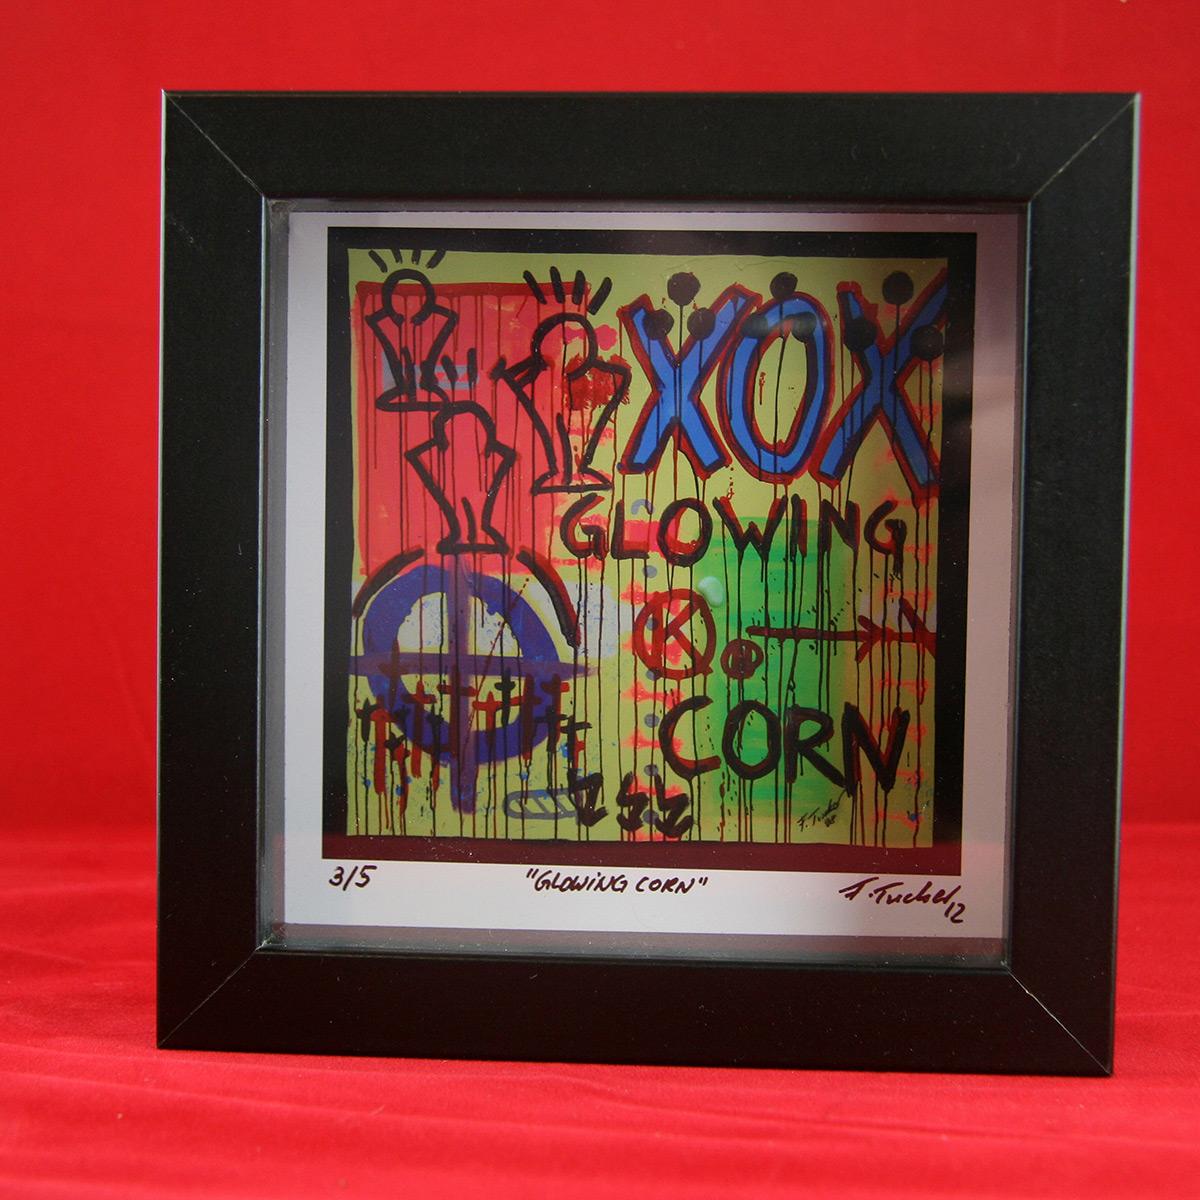 2012 - Glowing Corn - Edition 5